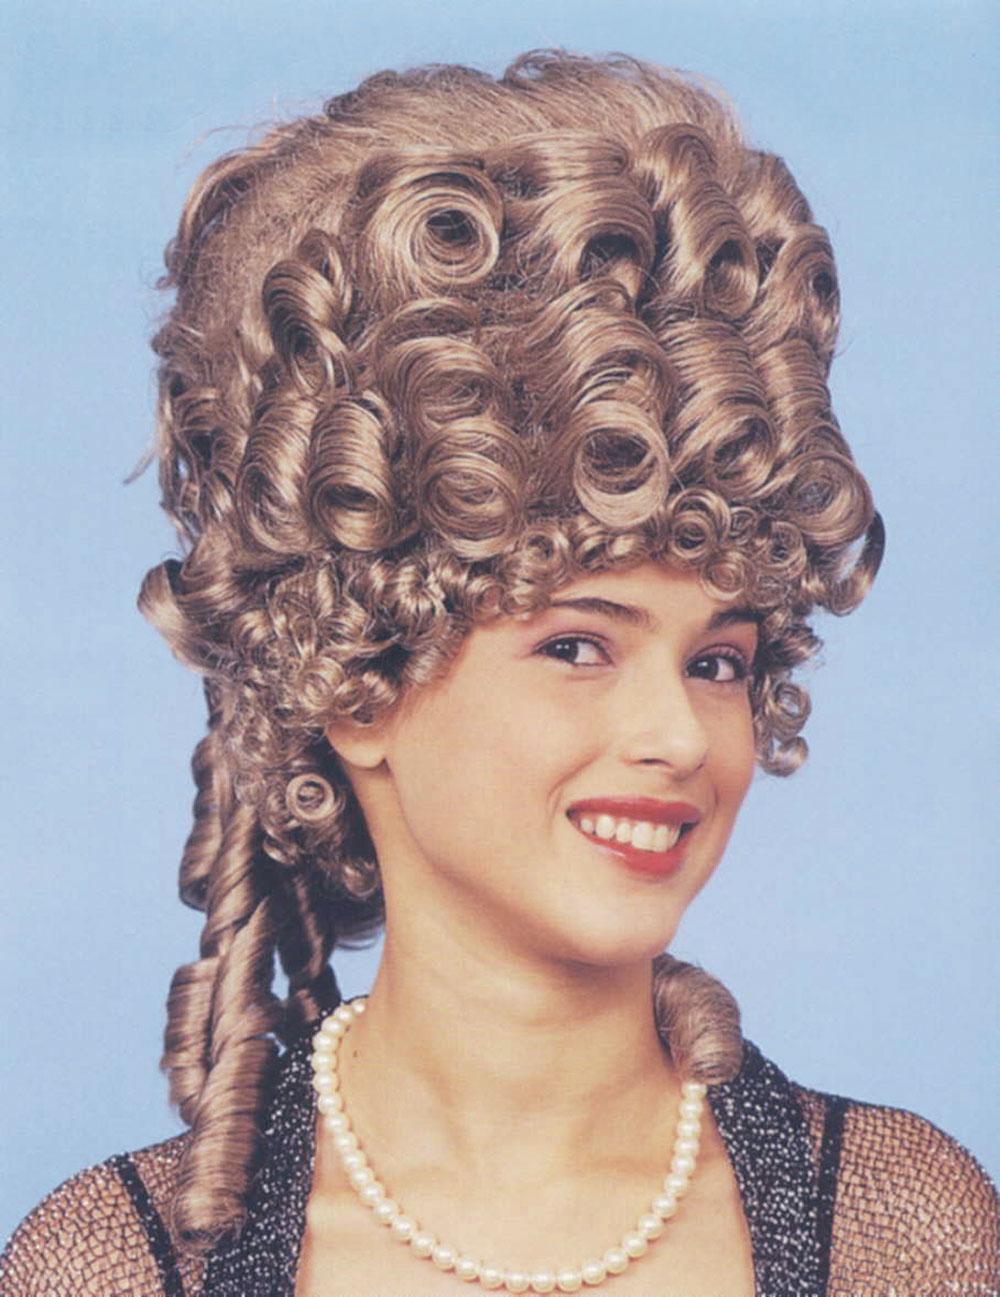 18th_century_wigs